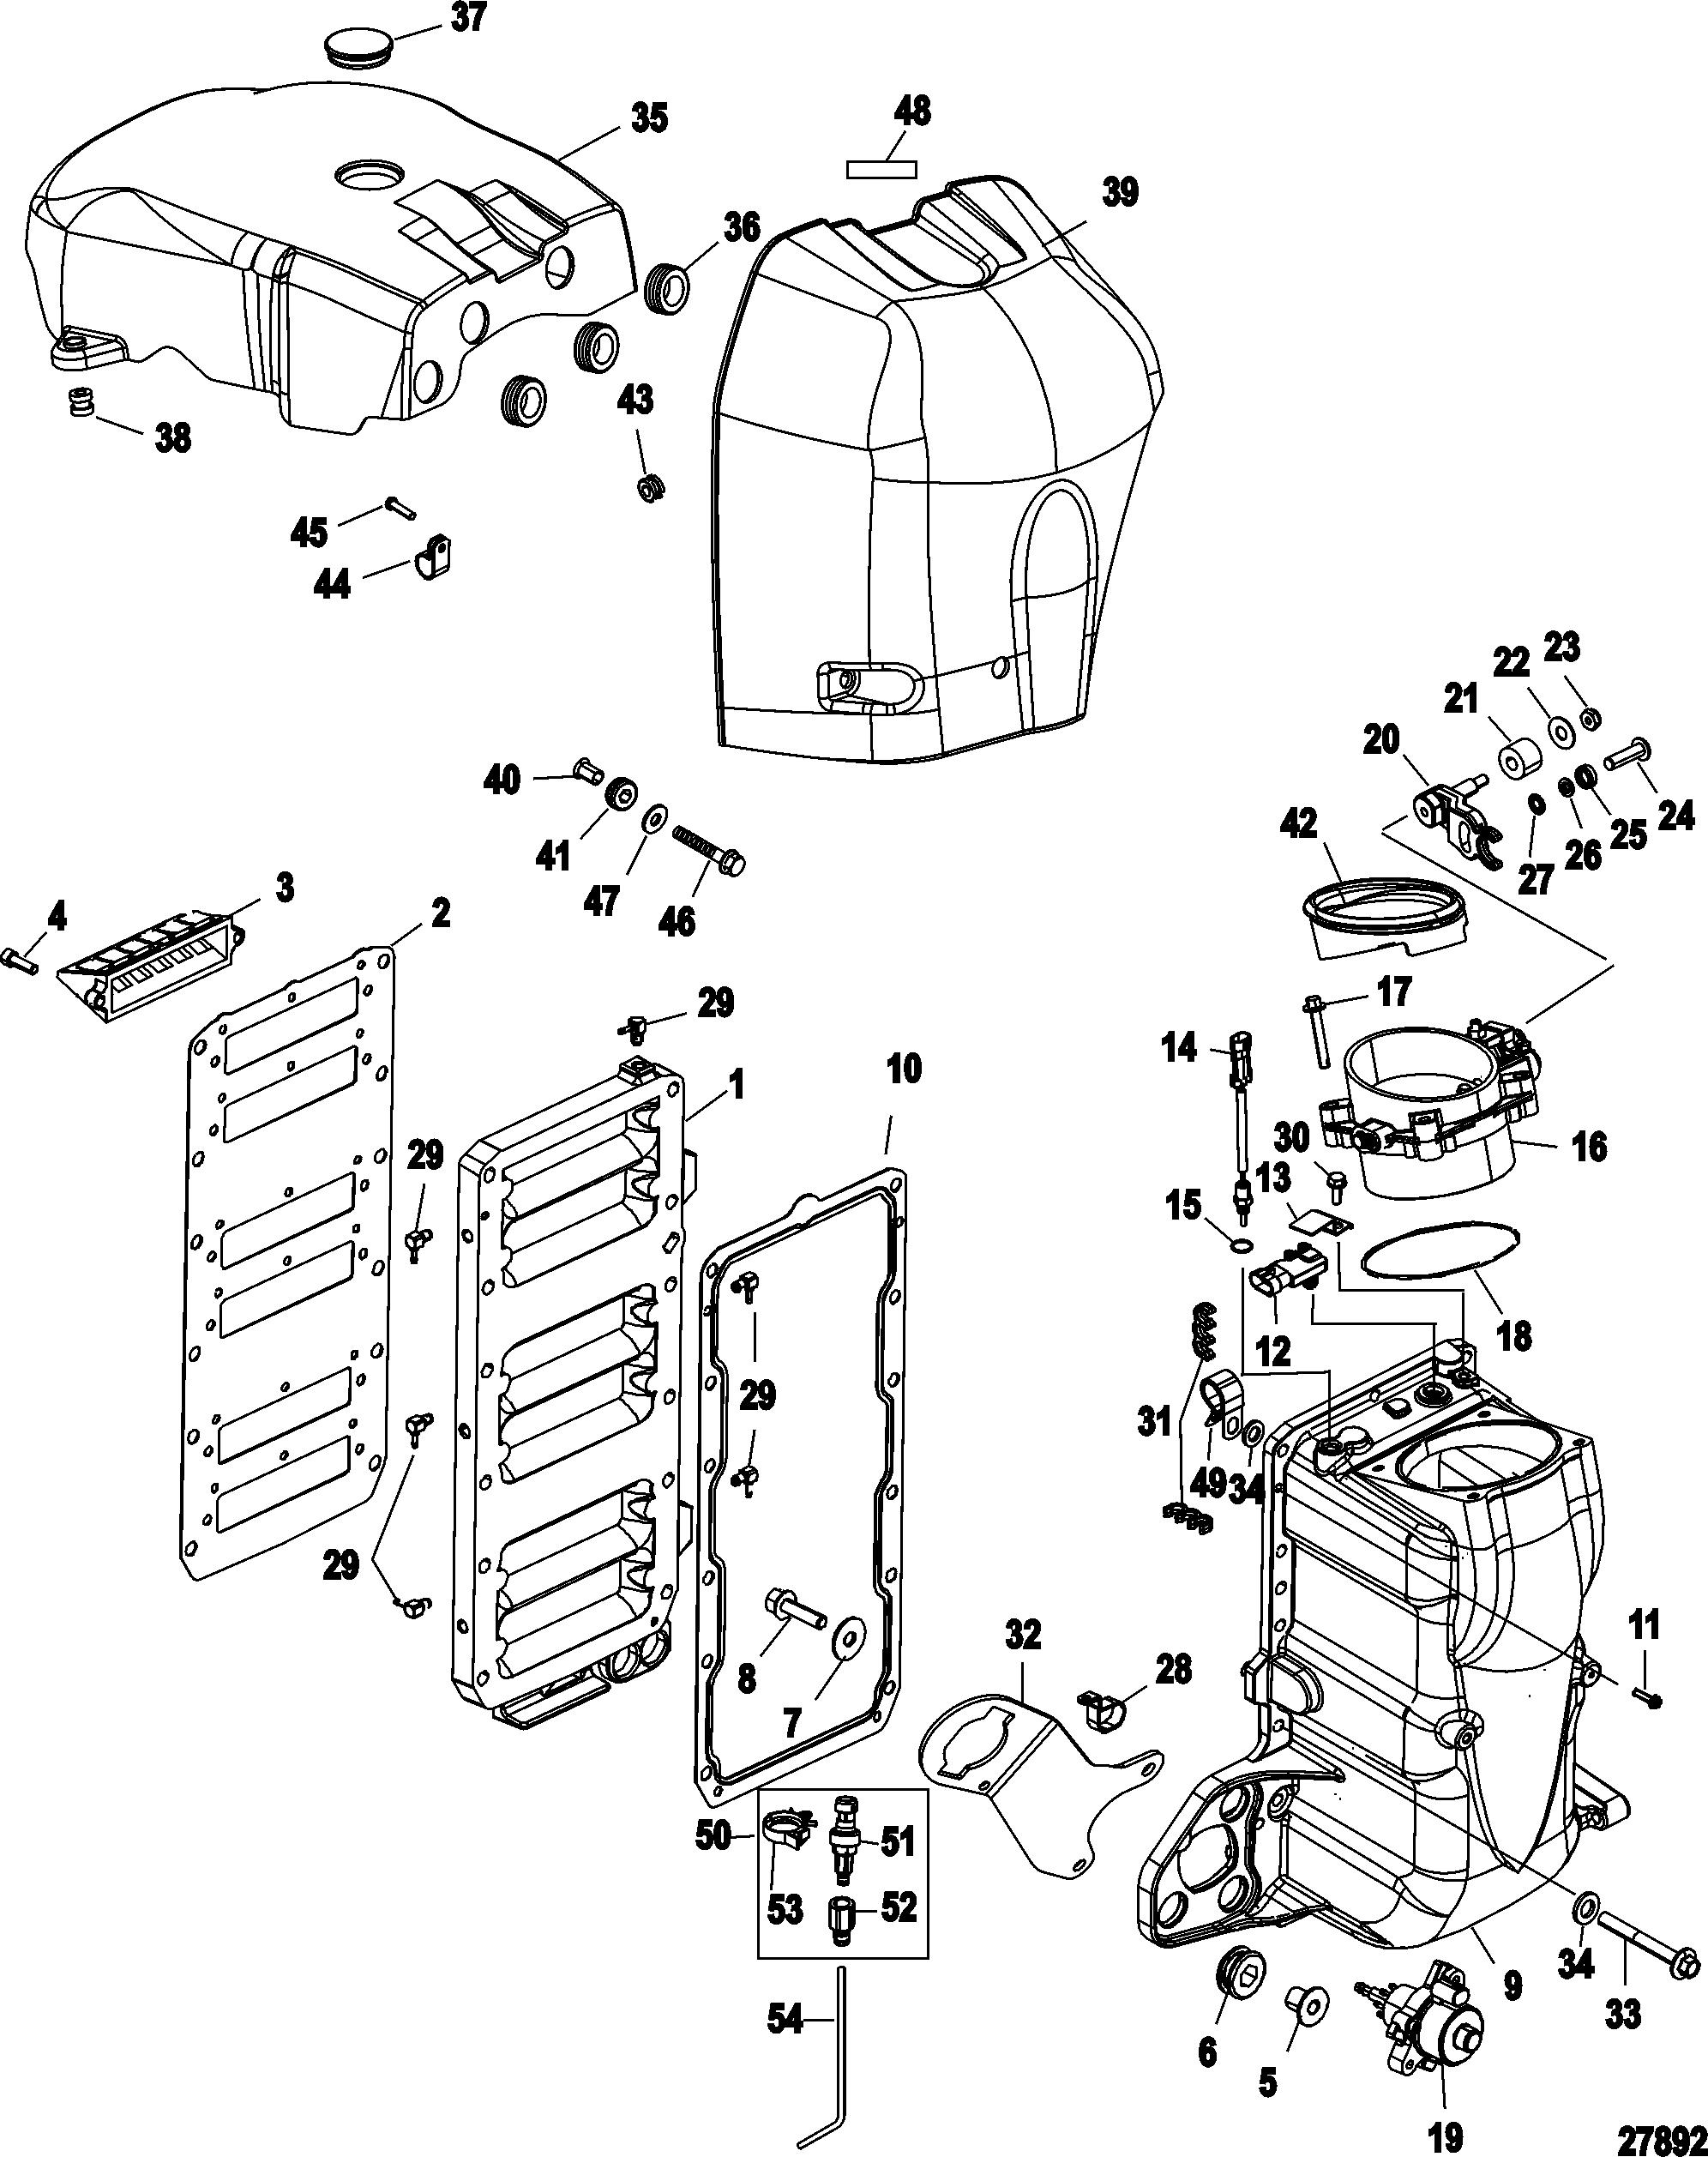 1976 Mercury Tachometer Wiring Diagram as well 8 Hp Yamaha Outboard Wiring Diagram further 2wktz Force Nnn Nnn Nnnn It Will Not Start No Spark additionally Mercruiser Fuel Filter Separator likewise Integrated Air Fuel Module. on optimax engine diagram